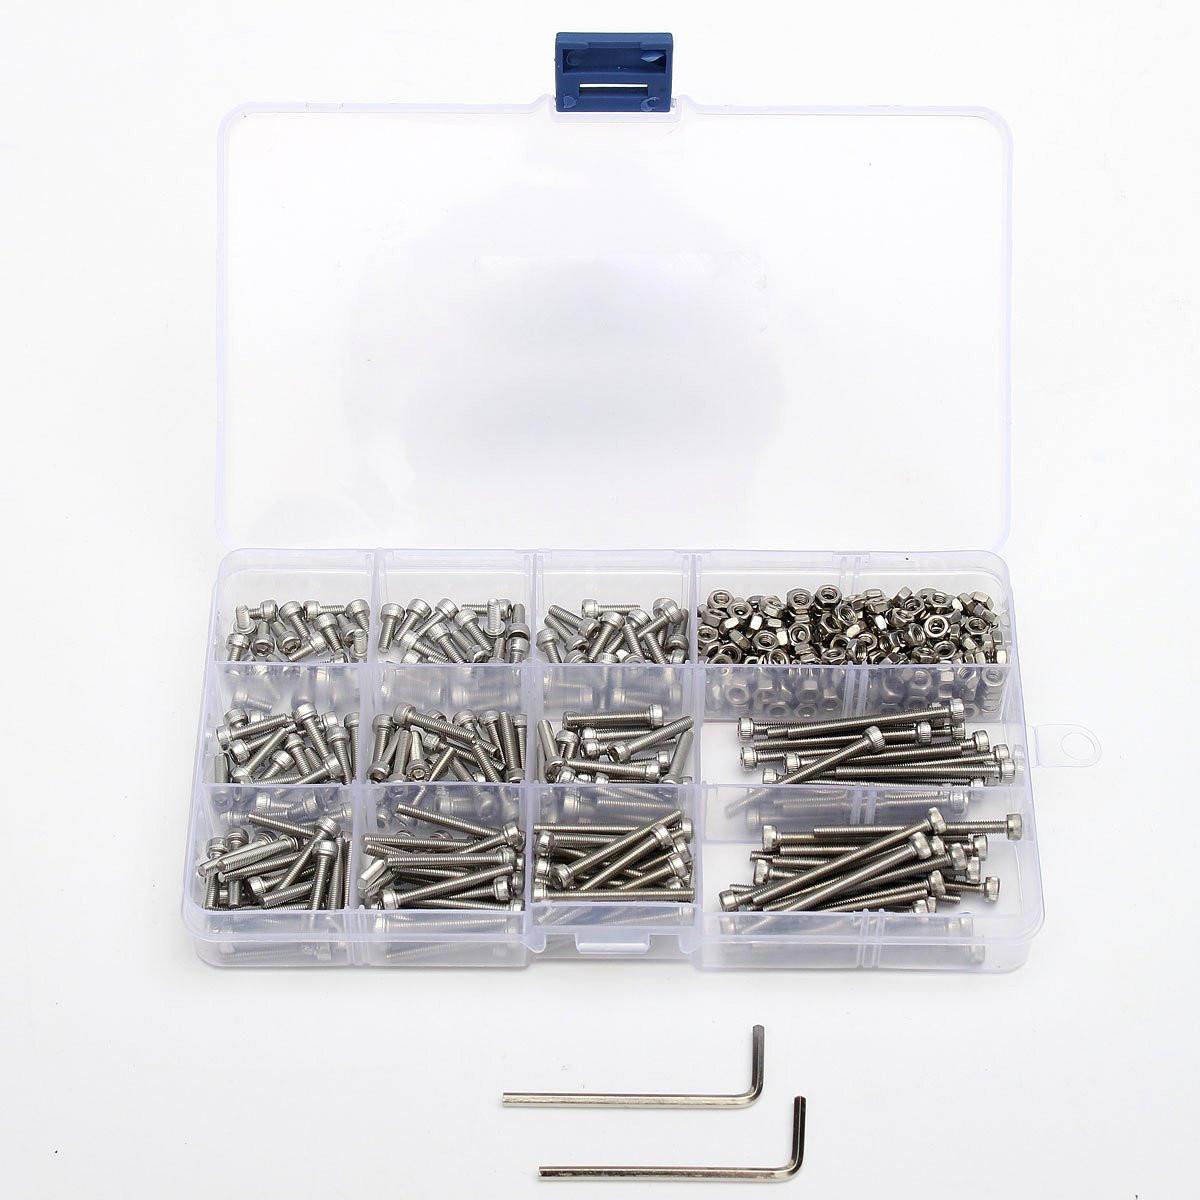 Suleve™ M3SS2 M3 442Pcs Stainless Steel Allen Bolt Nut Hex Socket Cap Screw Assortment Kit